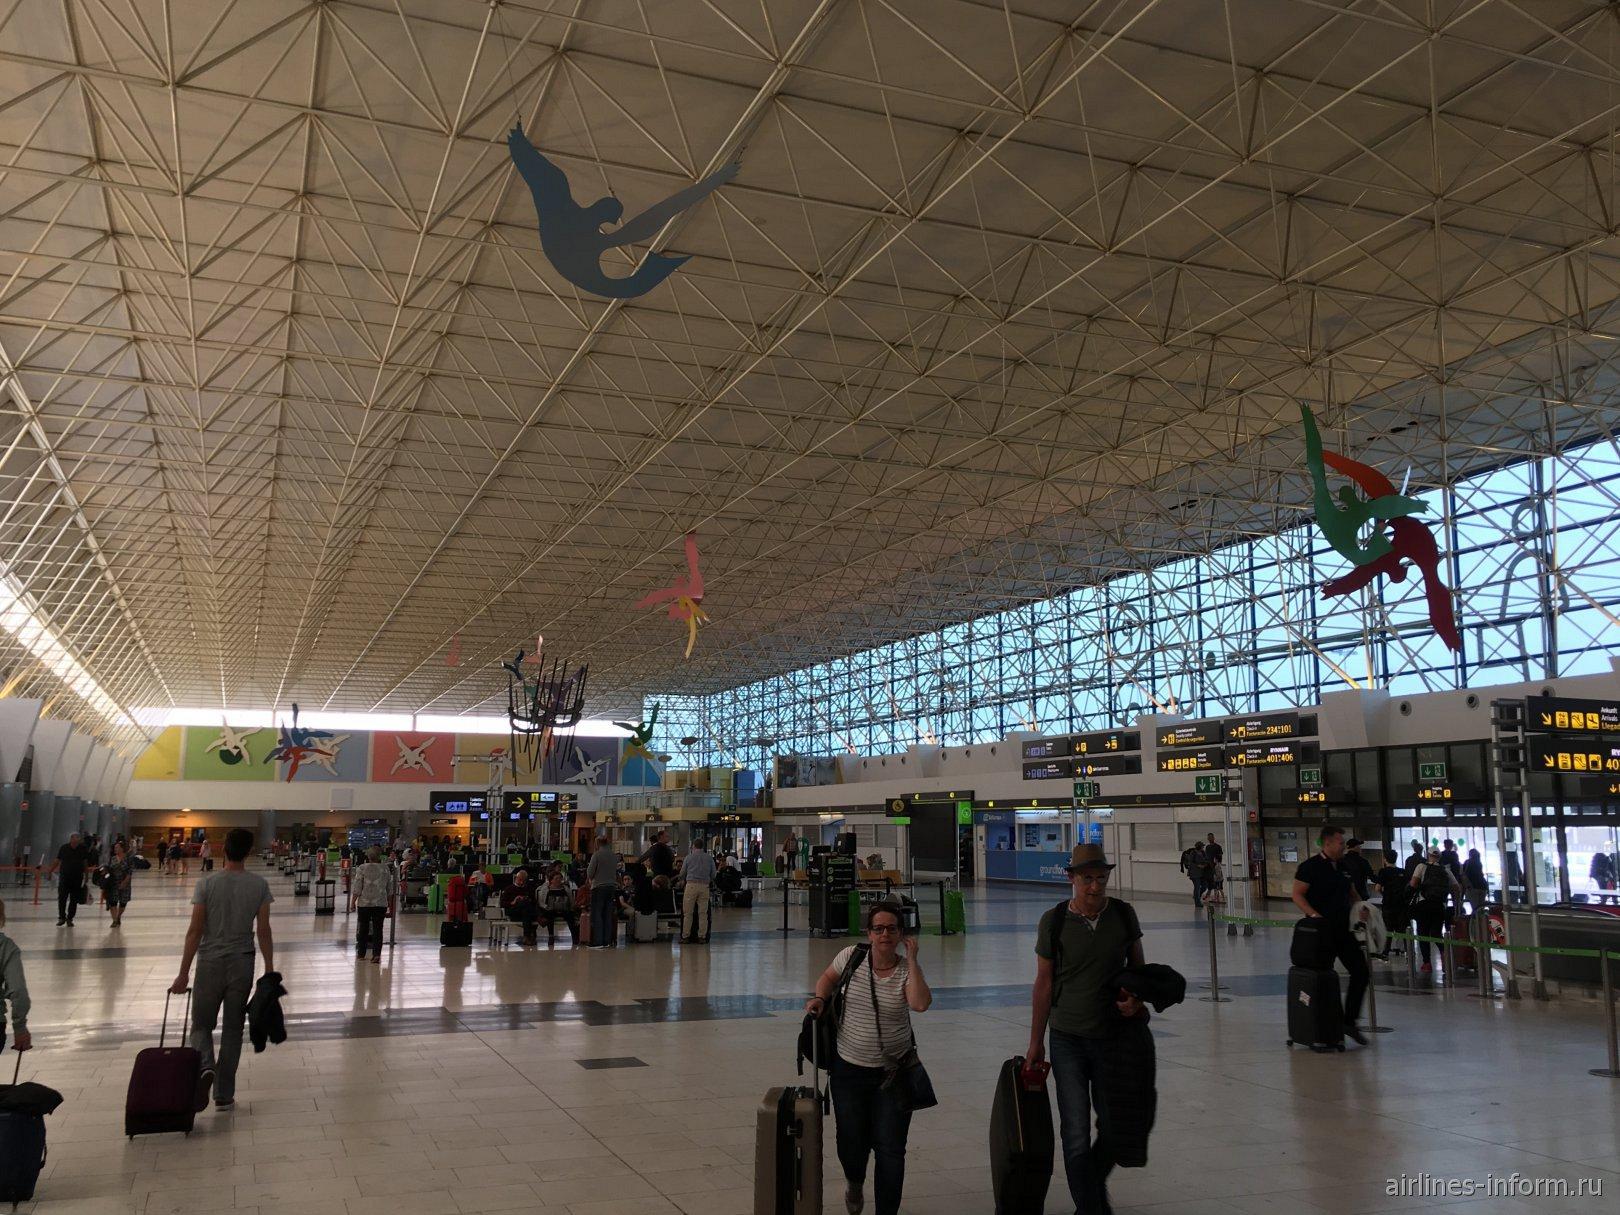 Внутри пассажирского терминала аэропорта Лас-Пальмас-де-Гран-Канария